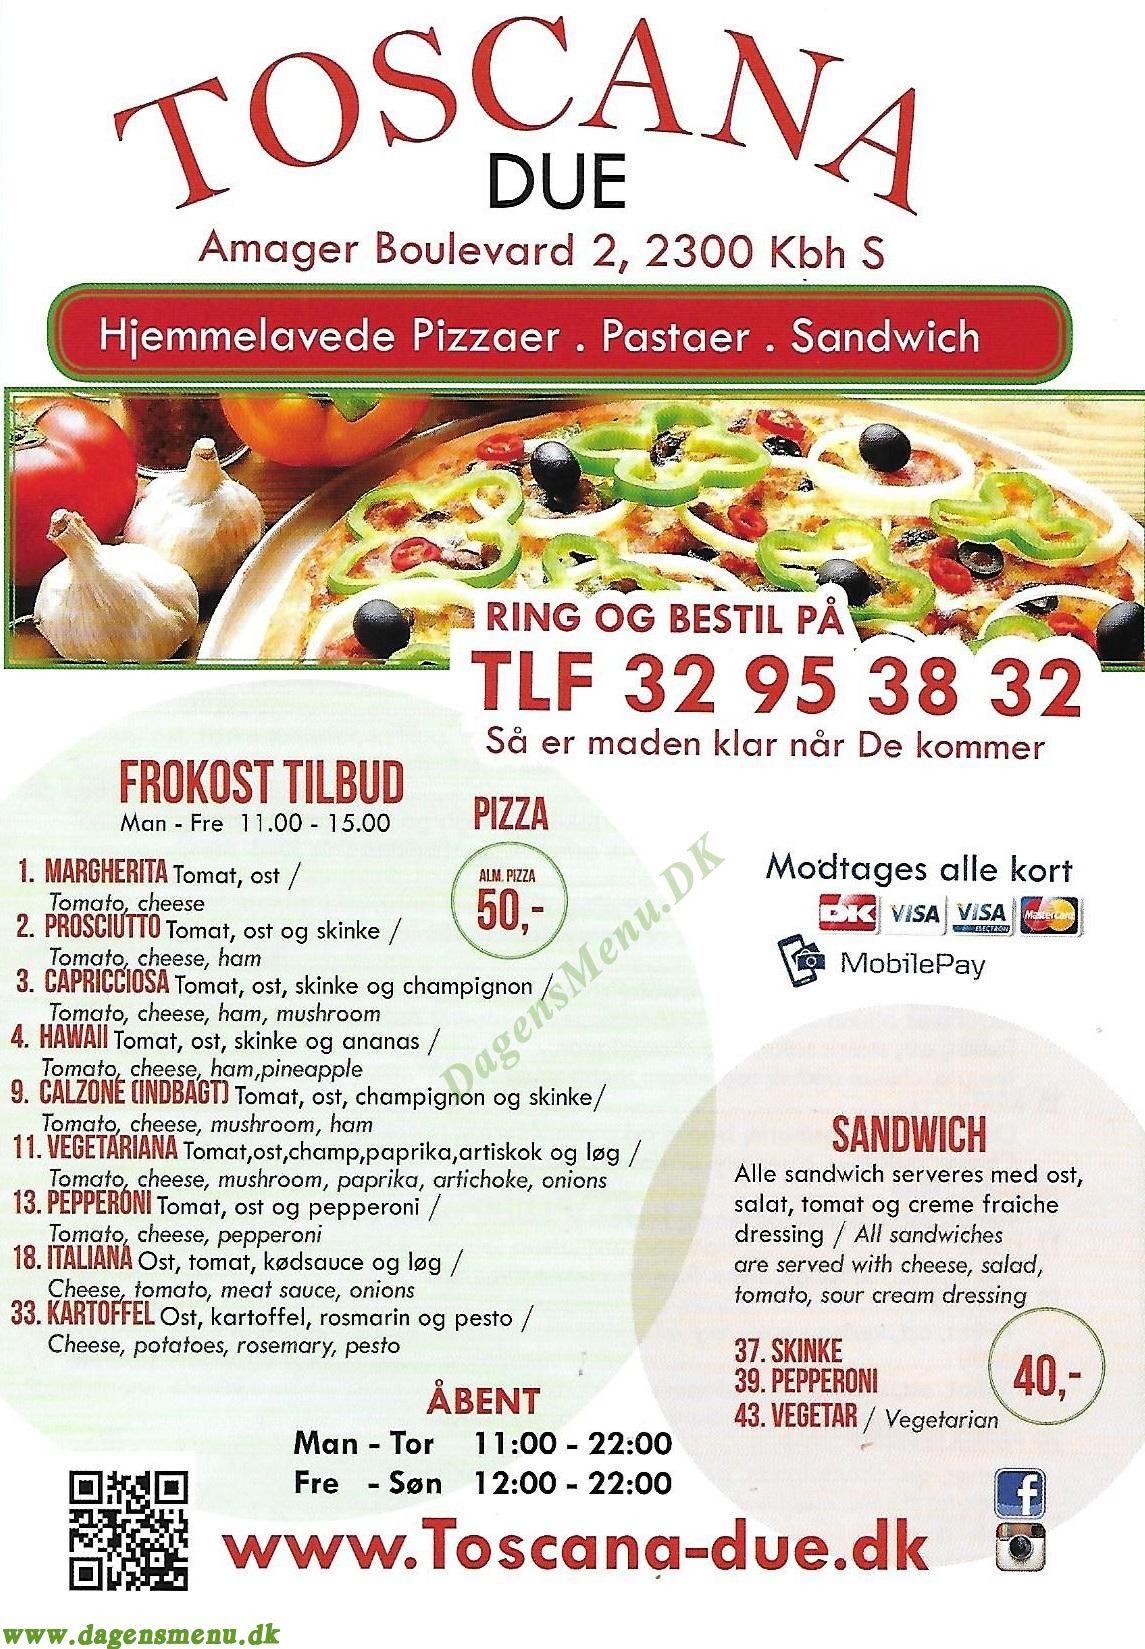 Amager Toscana due Pizza - Menukort